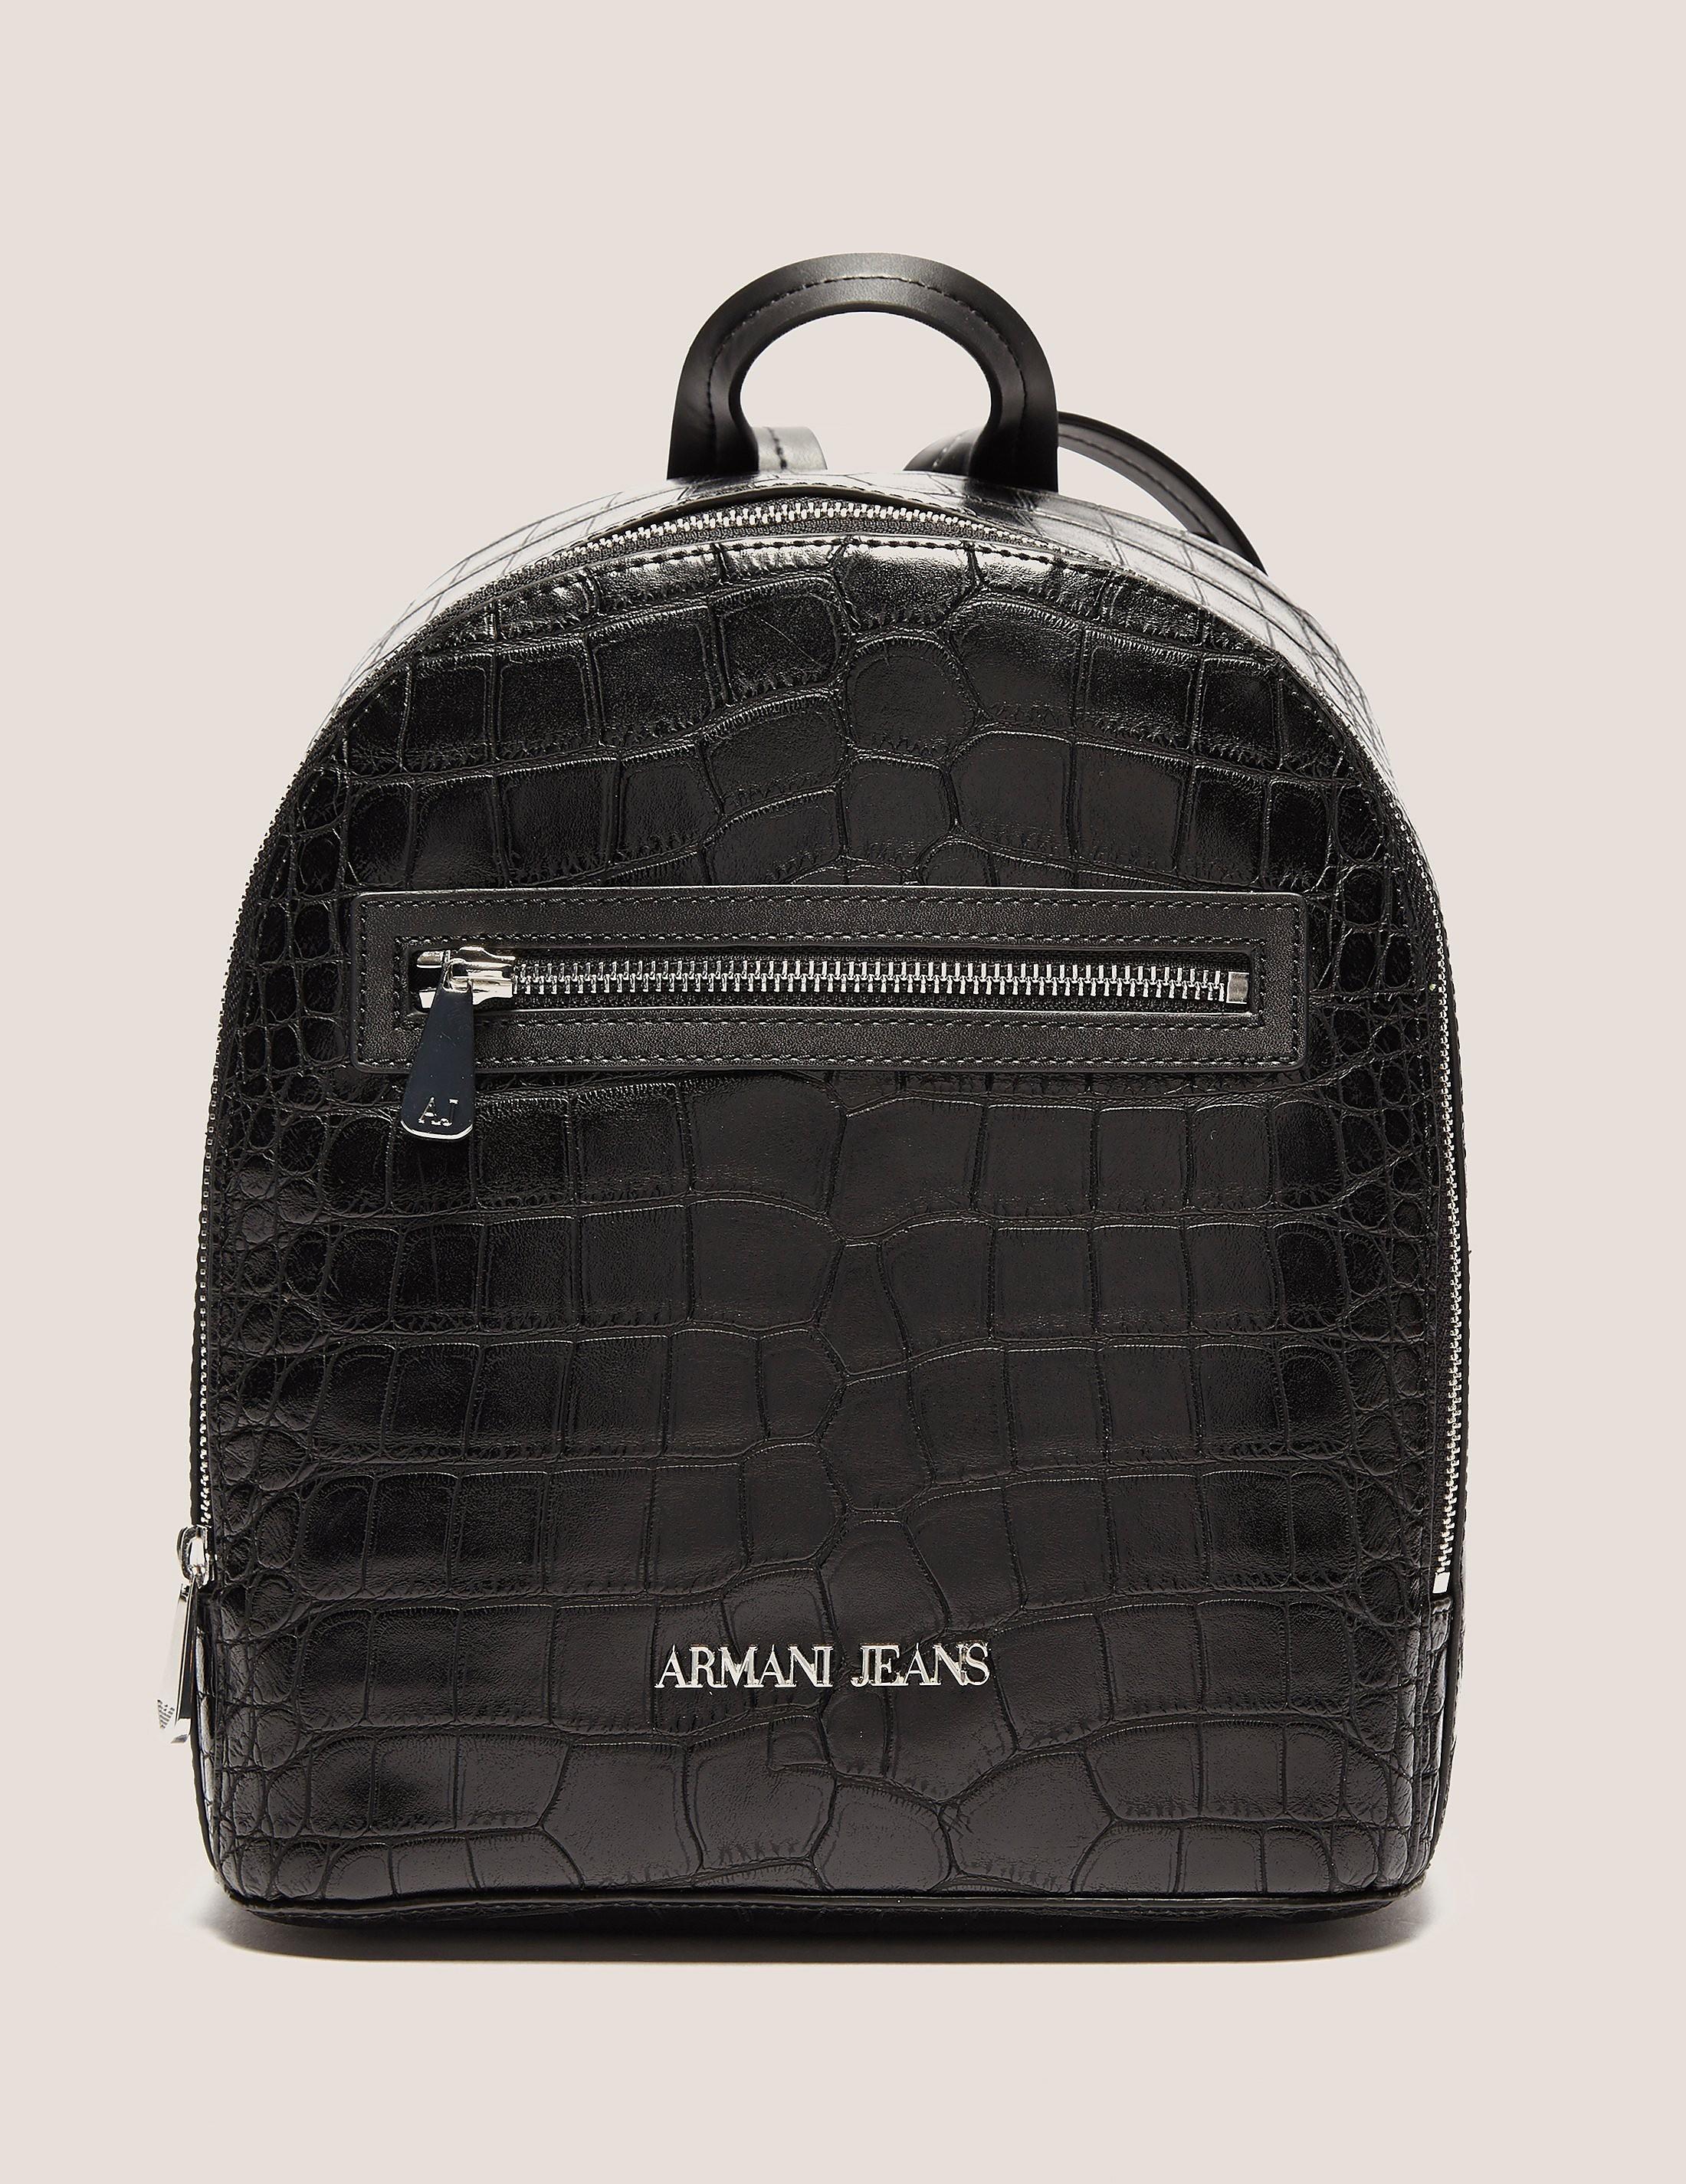 Armani Jeans Croc Back Pack